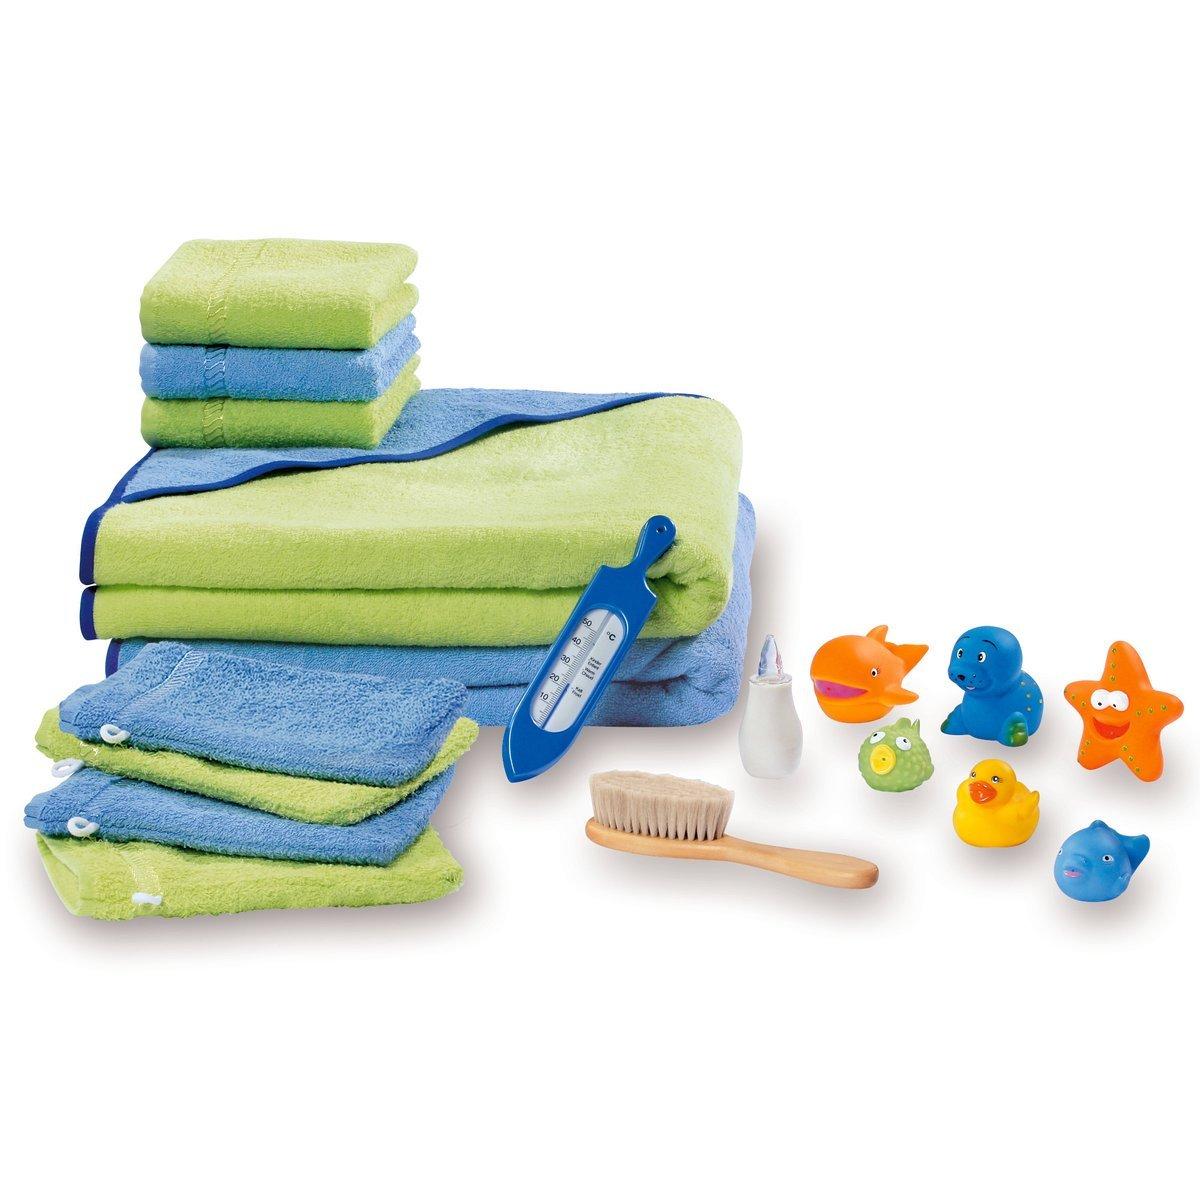 WÖRNER Bade-Set Premium, mehrfarbig